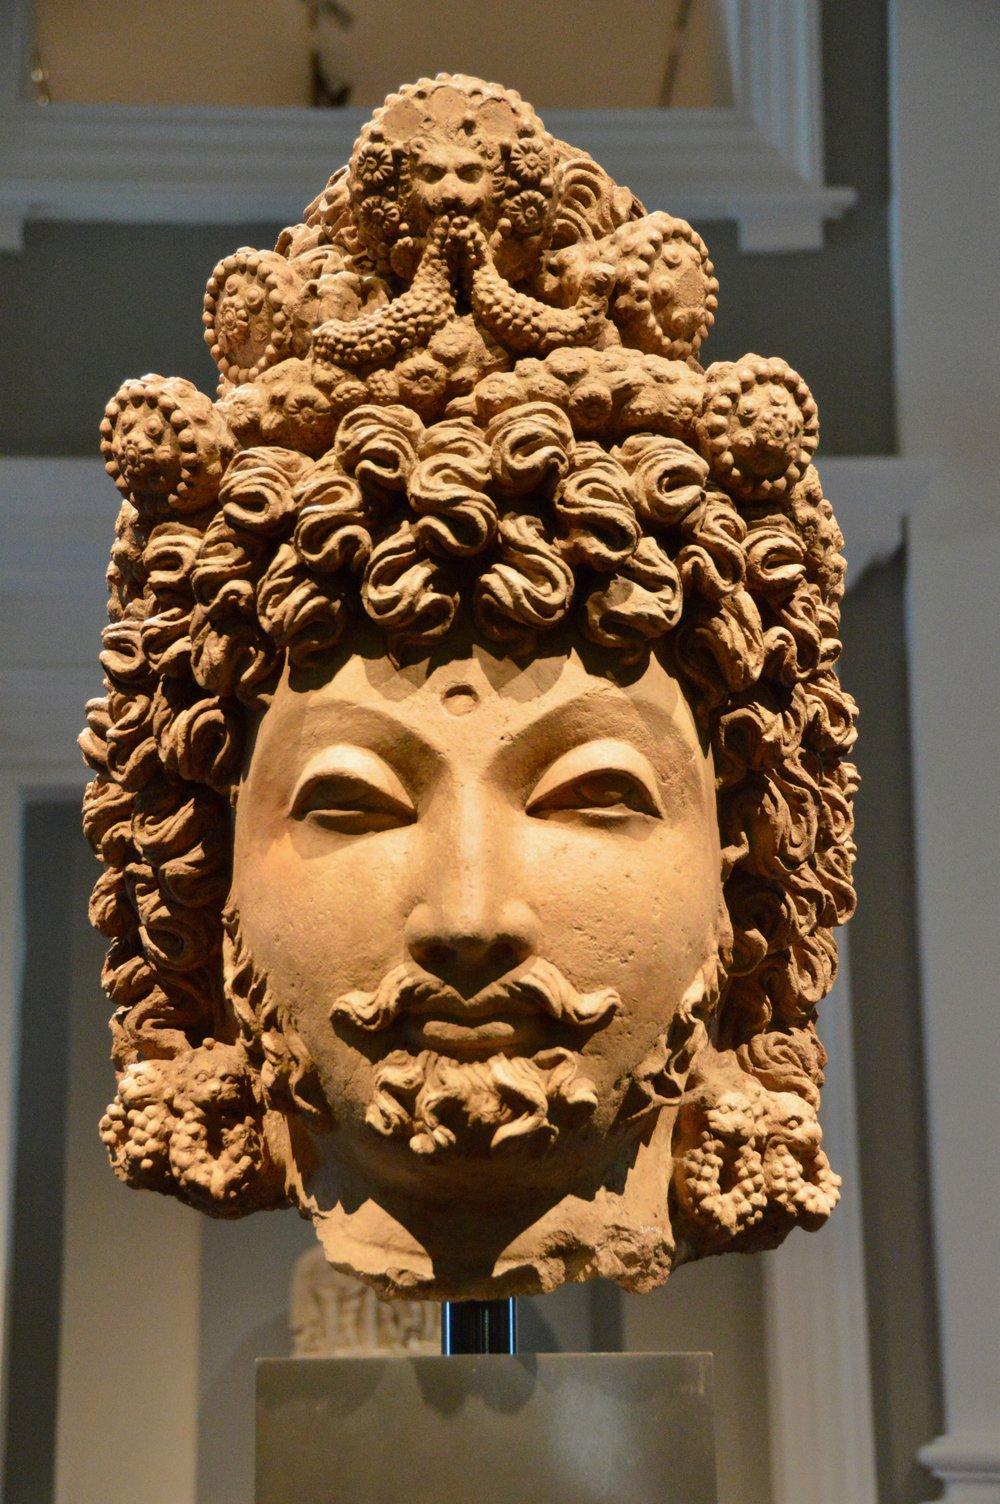 Gandhara, a 4th century bodhisattva